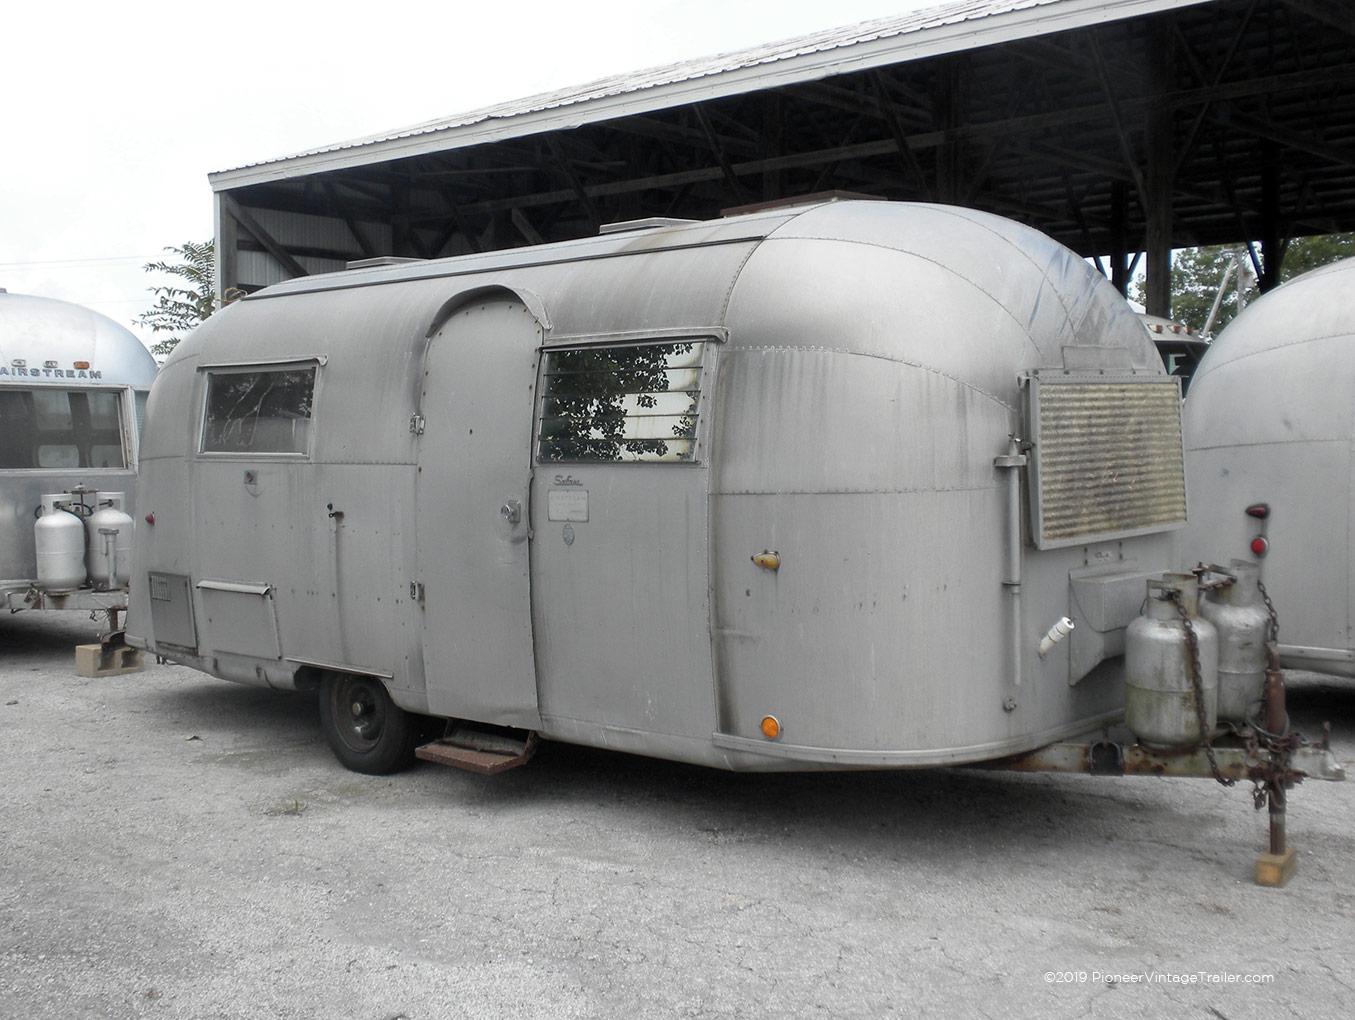 1964 Airstream Safari Pioneer Vintage Trailer